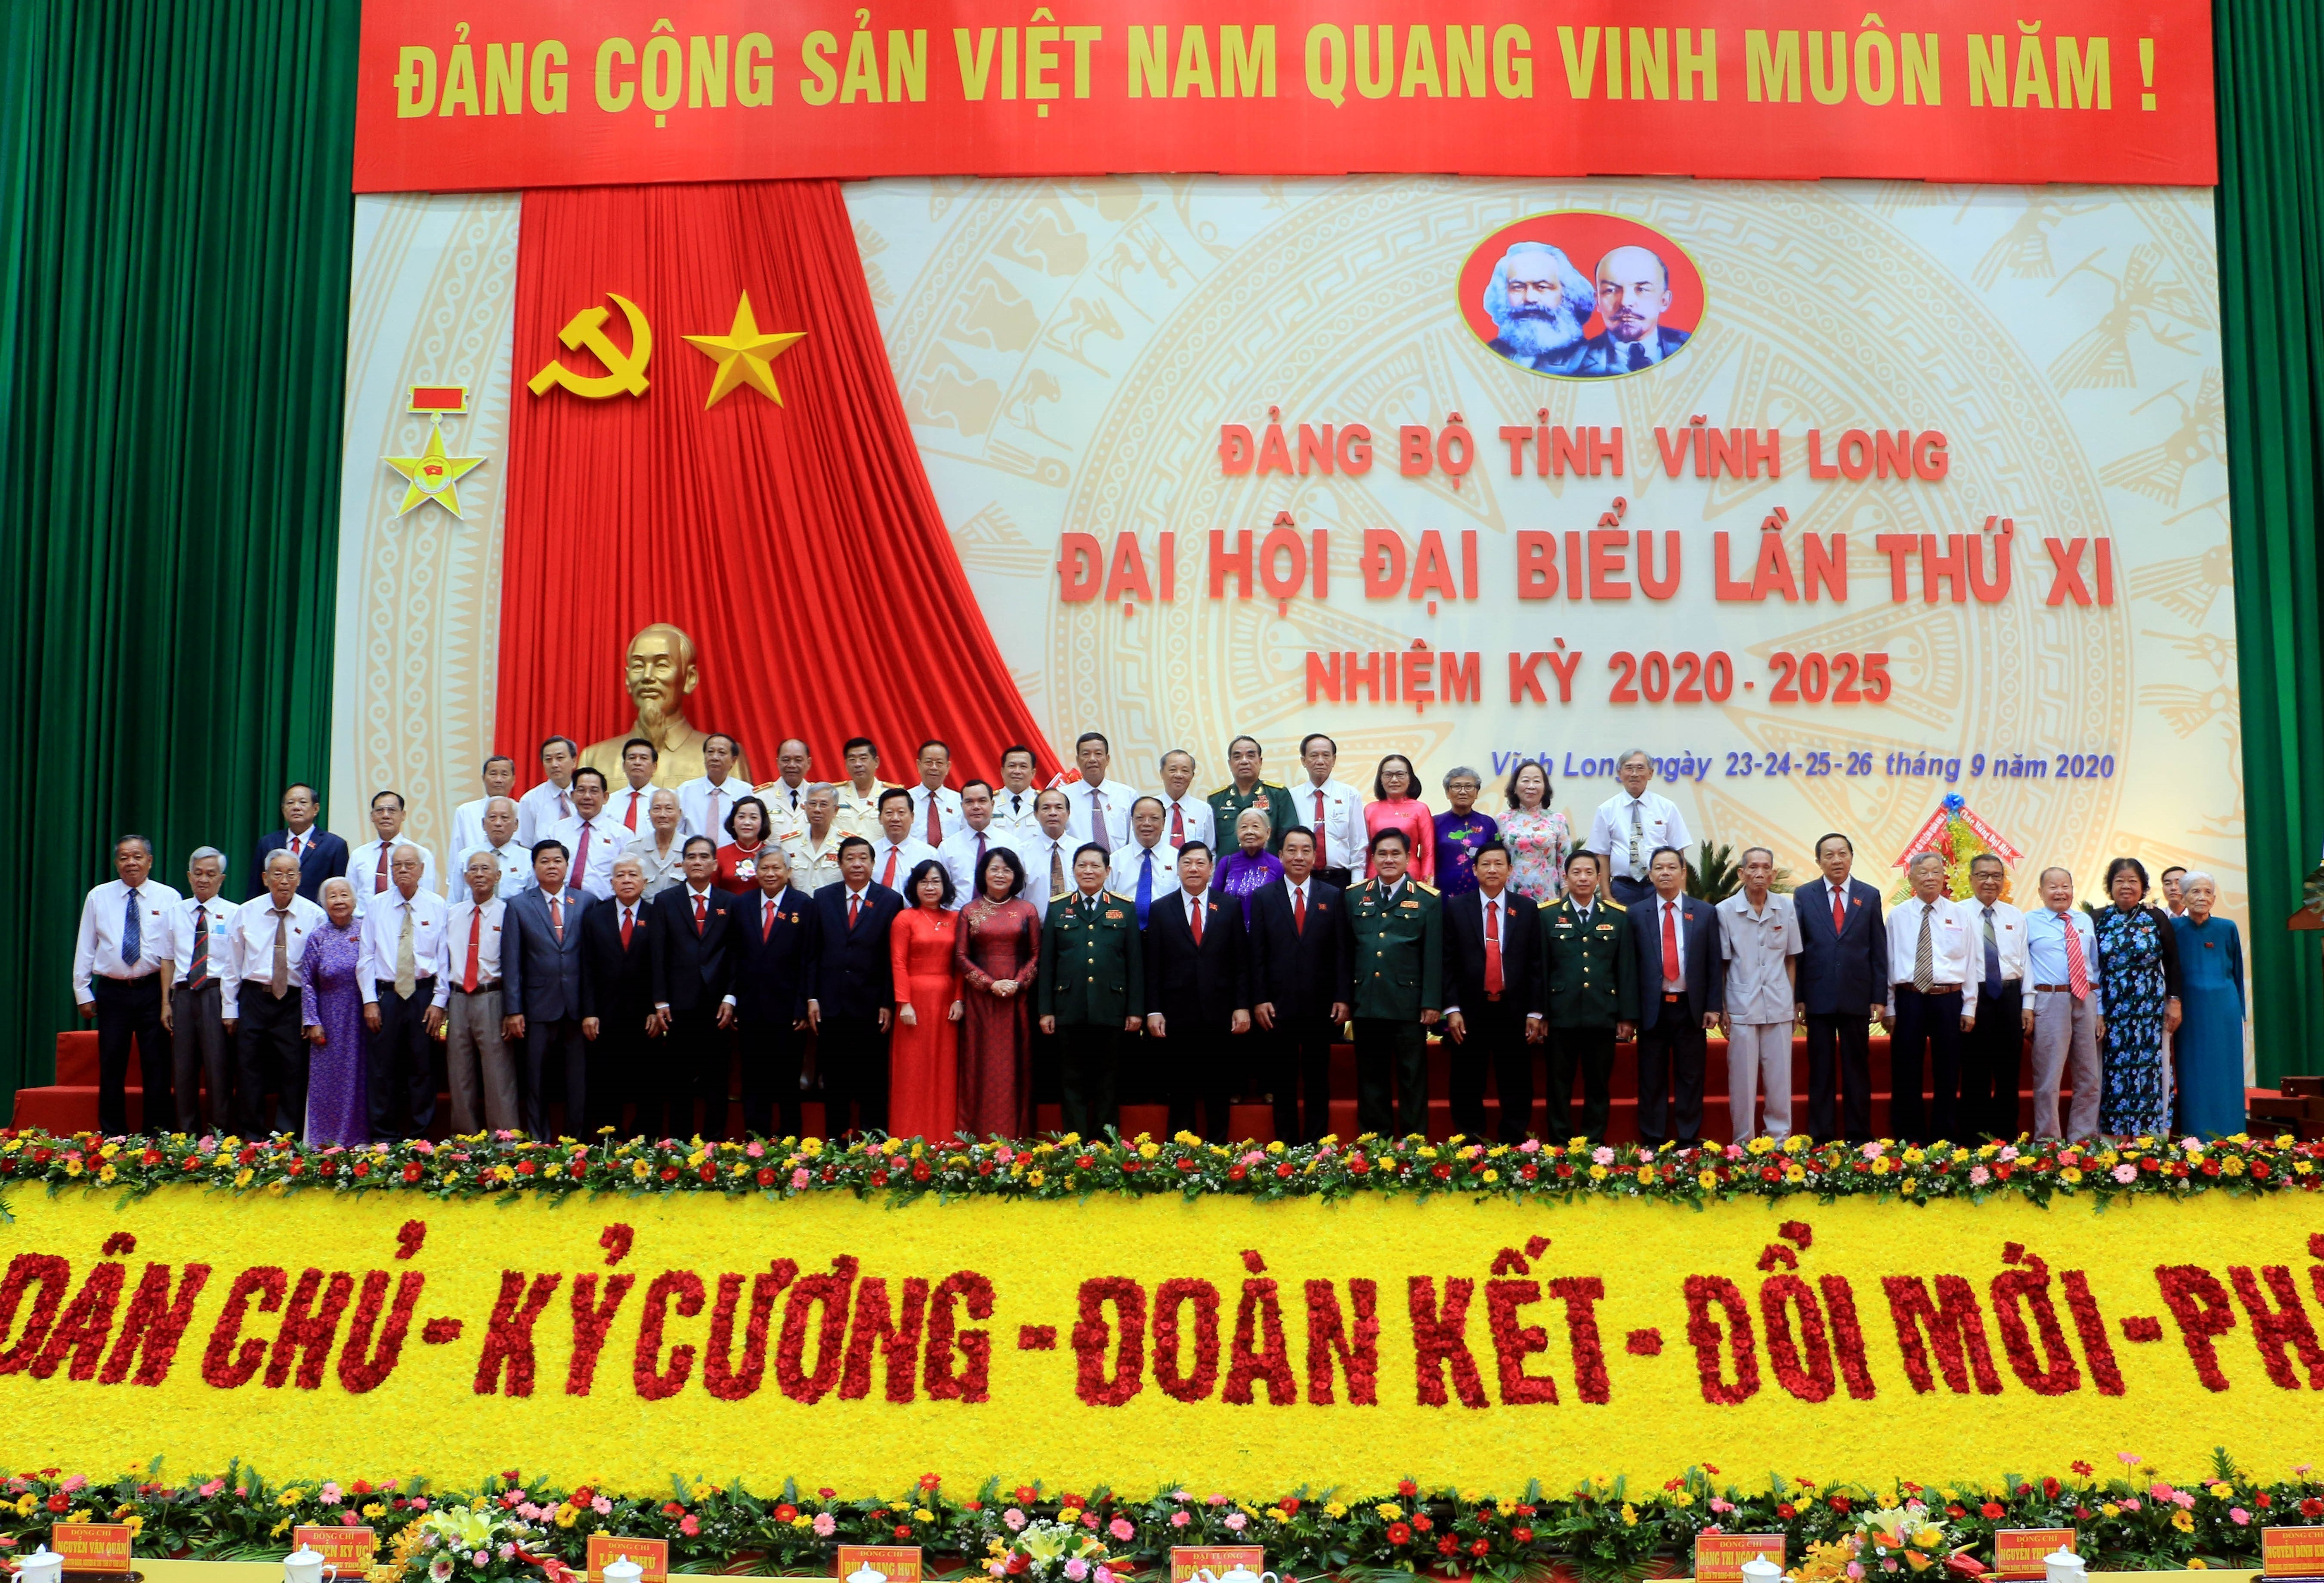 Khai mac Dai hoi Dai bieu Dang bo tinh Vinh Long nhiem ky 2020-2025 hinh anh 1